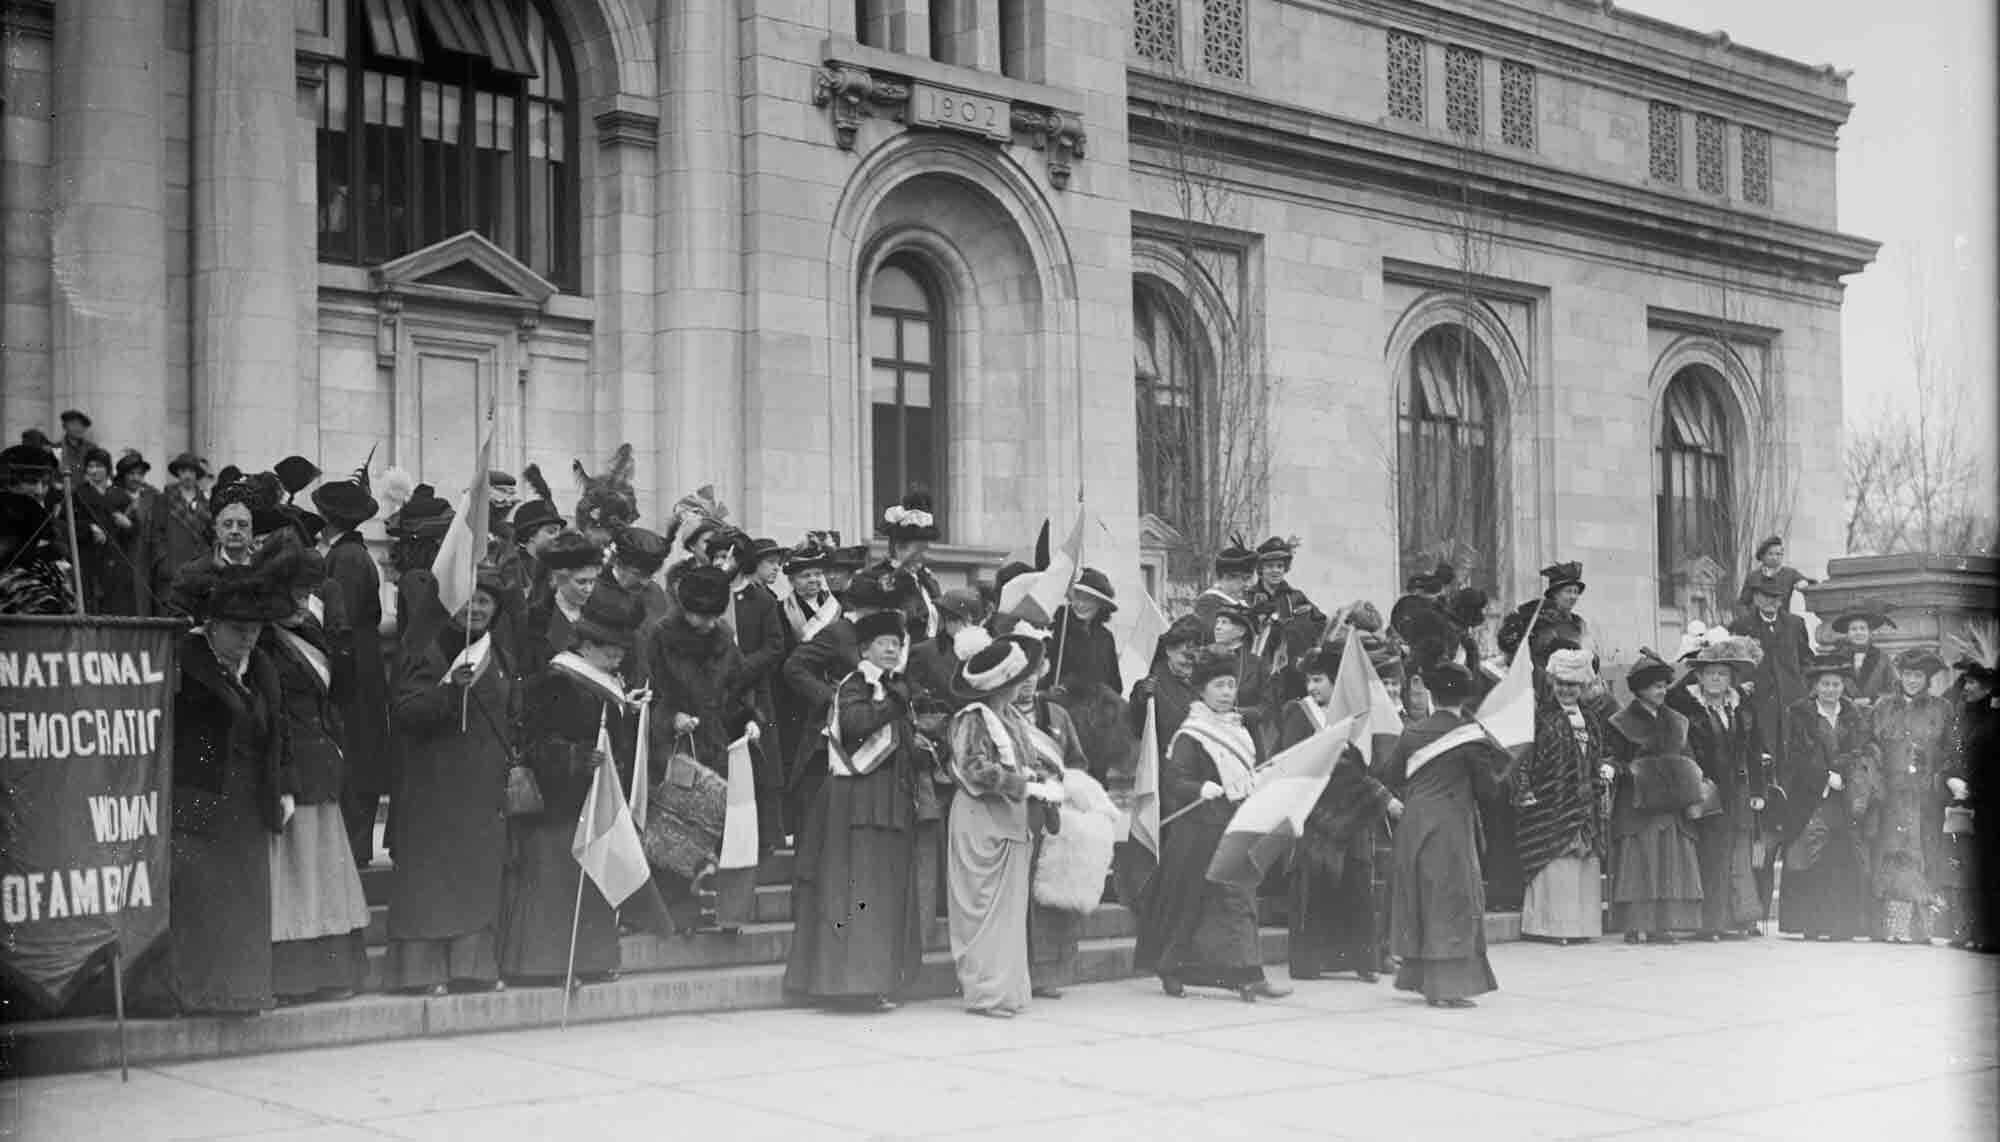 Wilson-Democratic-Woman-Suffrage-1914-LOC.jpg